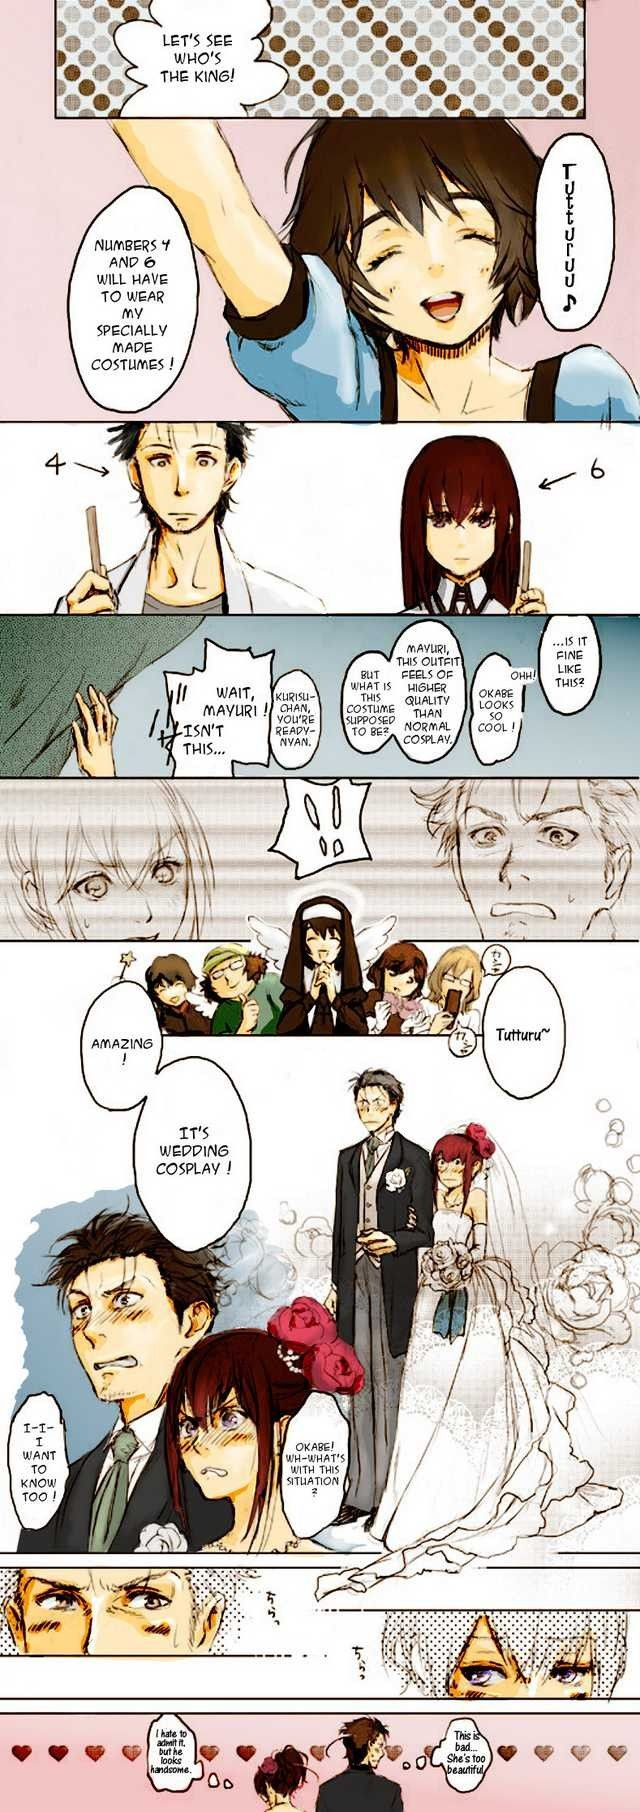 Wedding cosplay Anime, Steins gate 0, Anime funny